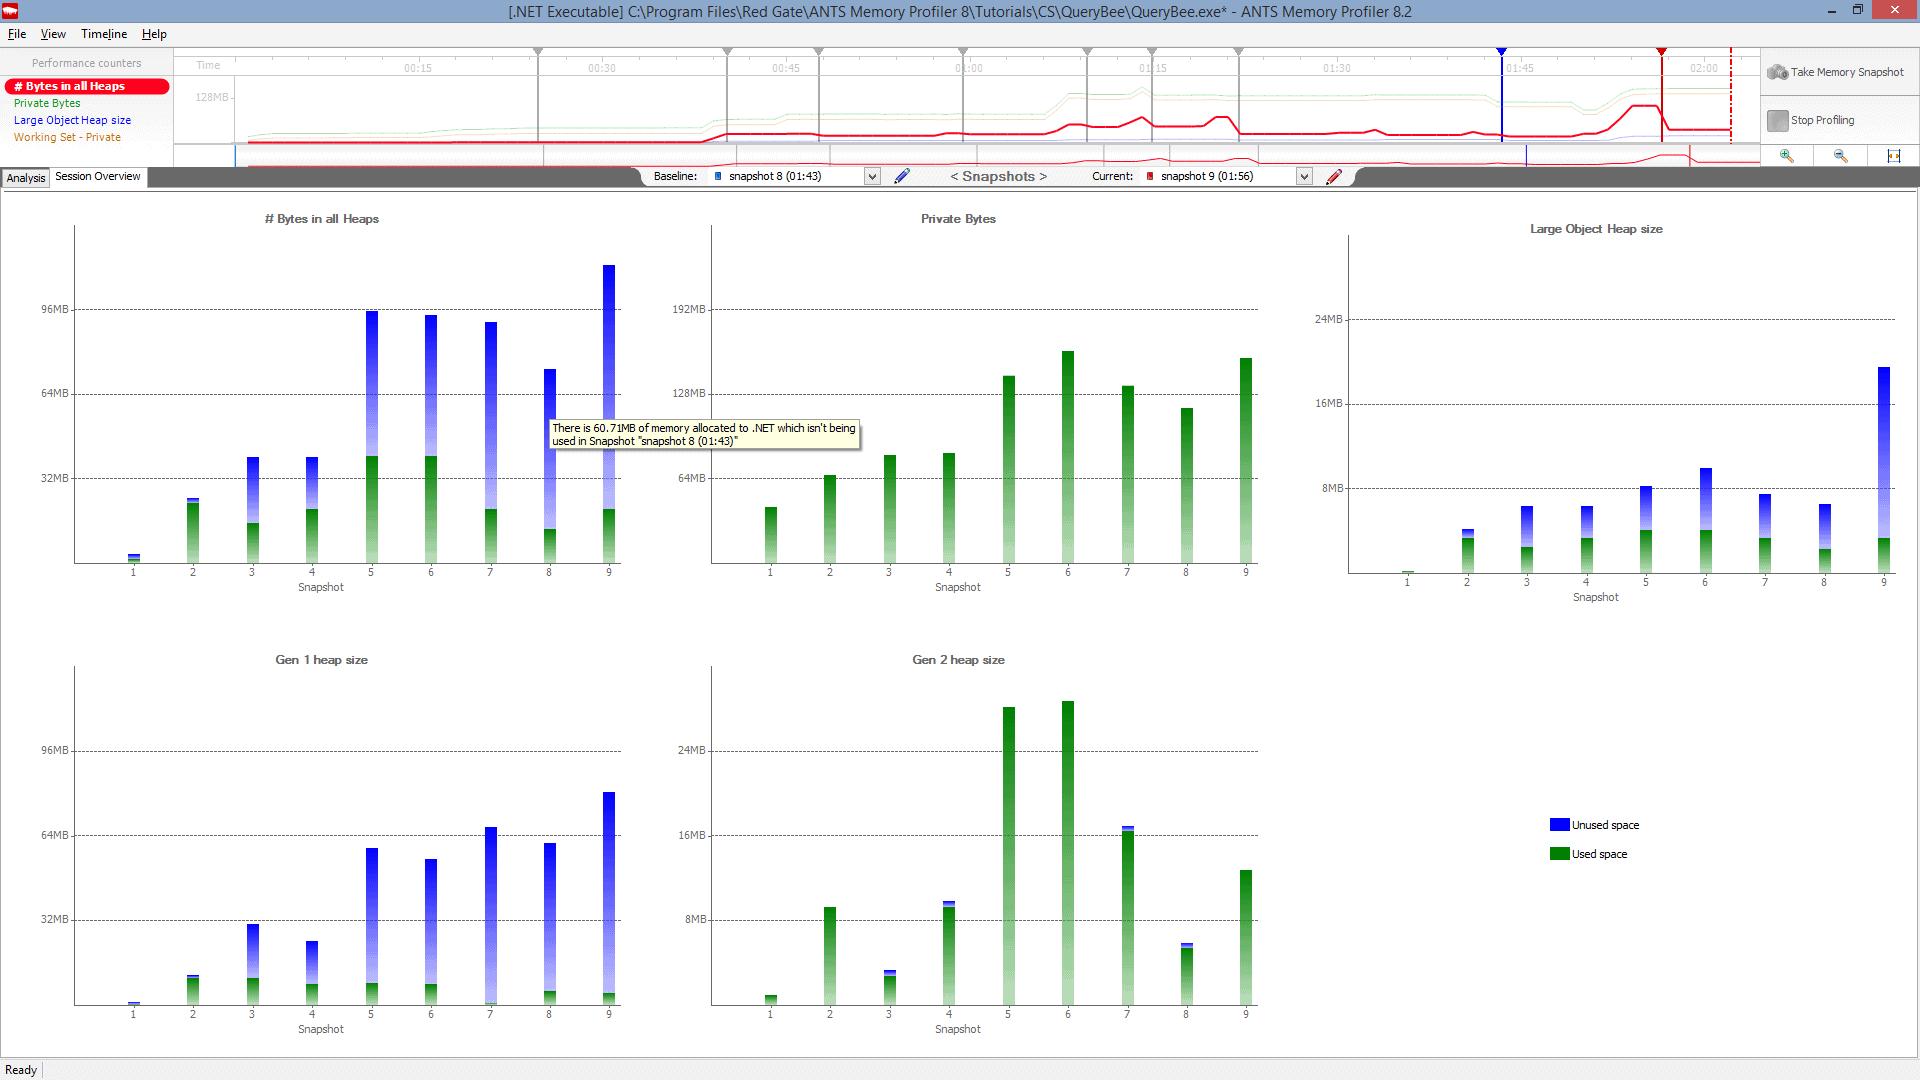 NET Memory Profiler By Redgate | ANTS Memory Profiler